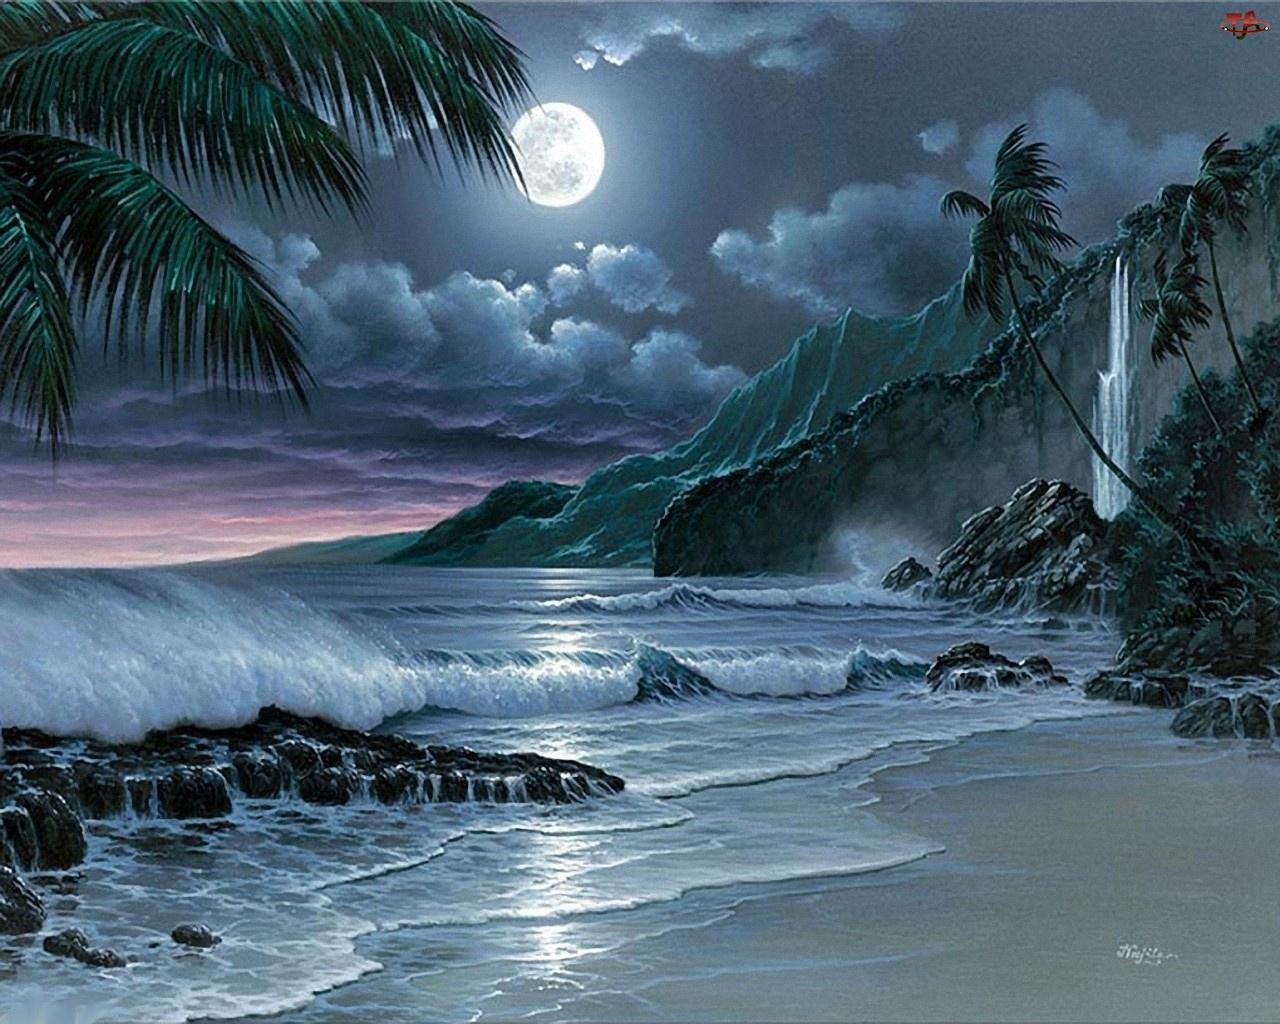 Księżyc, Morze, Góry, Plaża, Noc